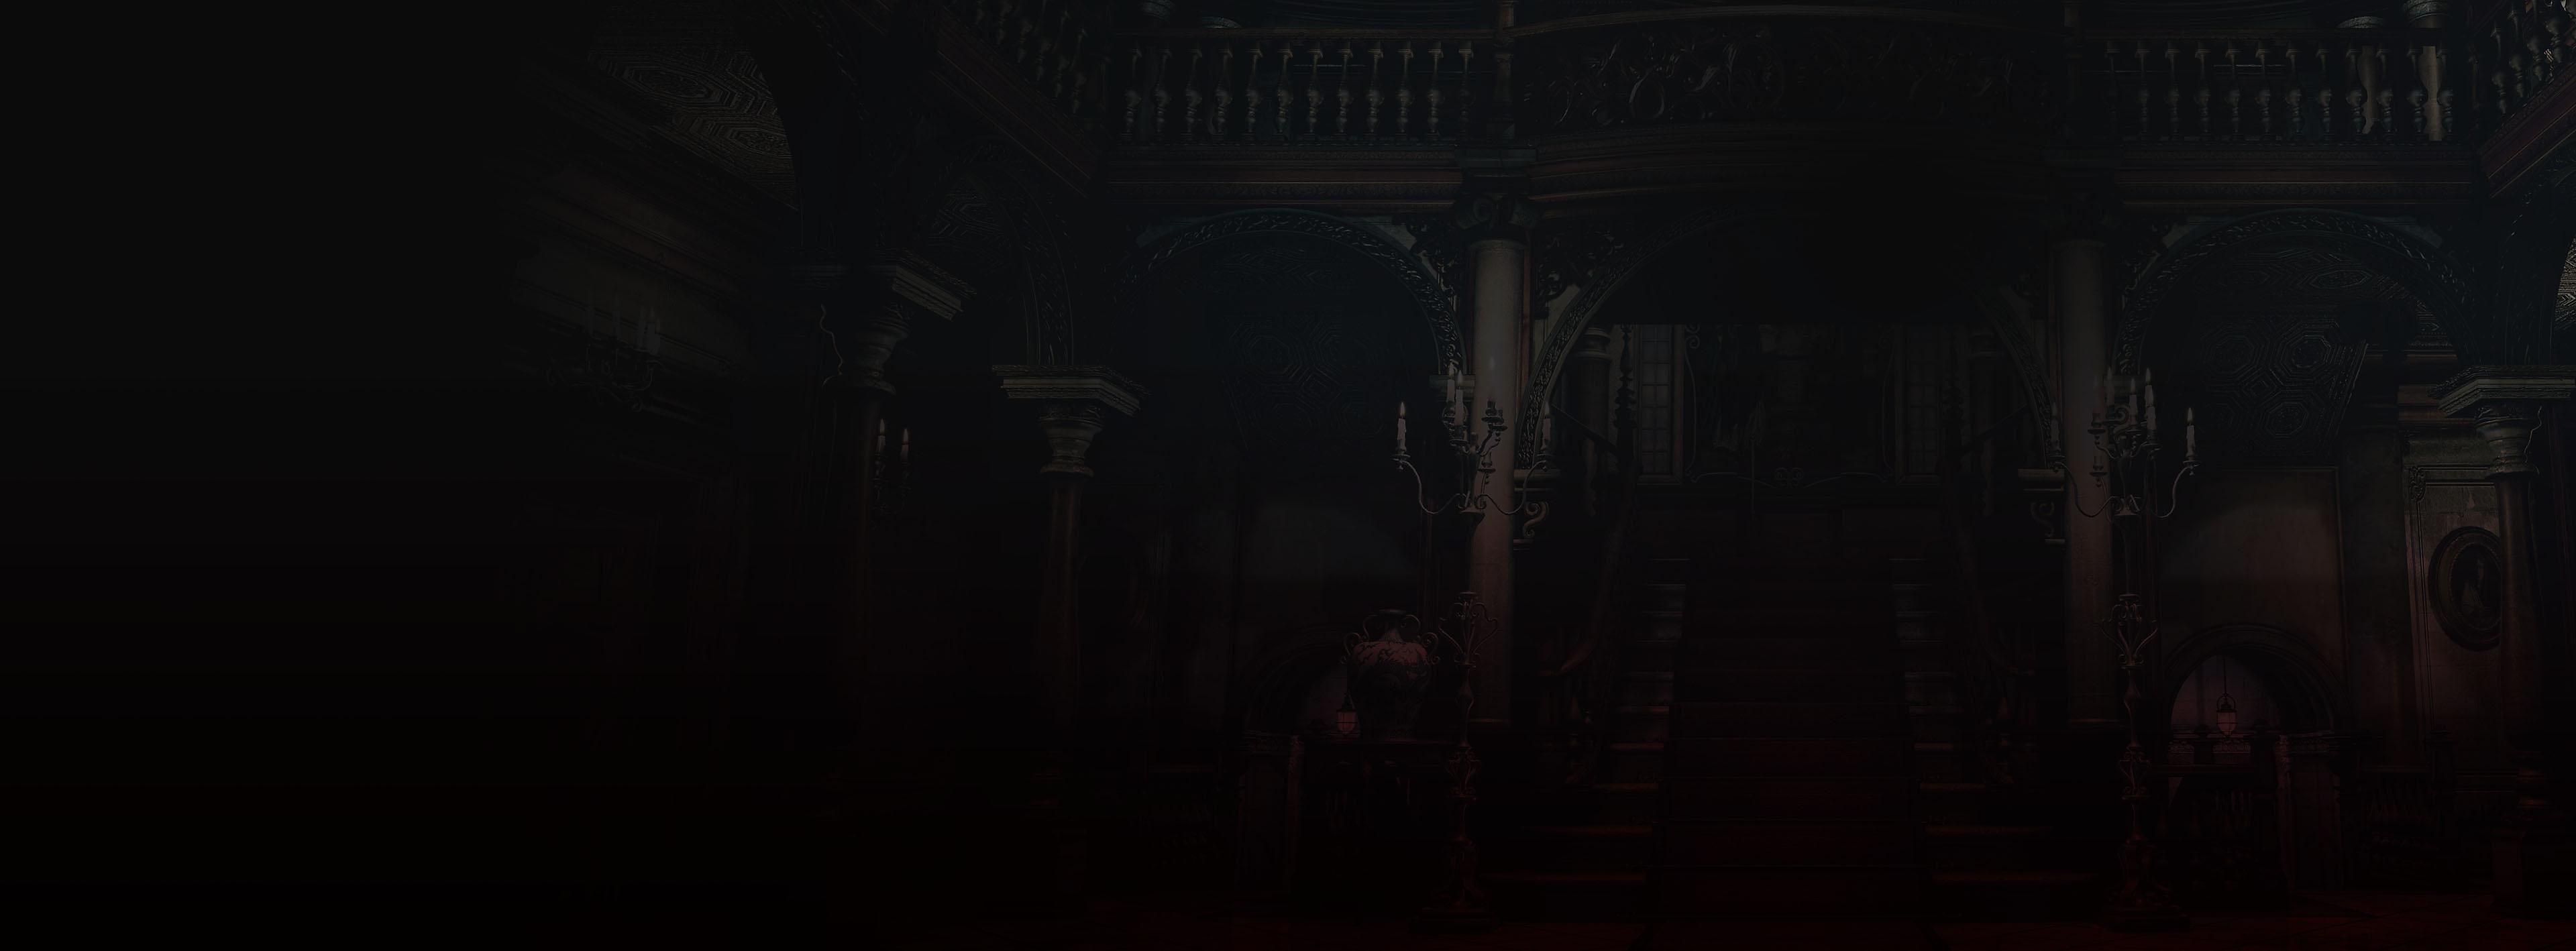 Resident Evil - fondo de mansión